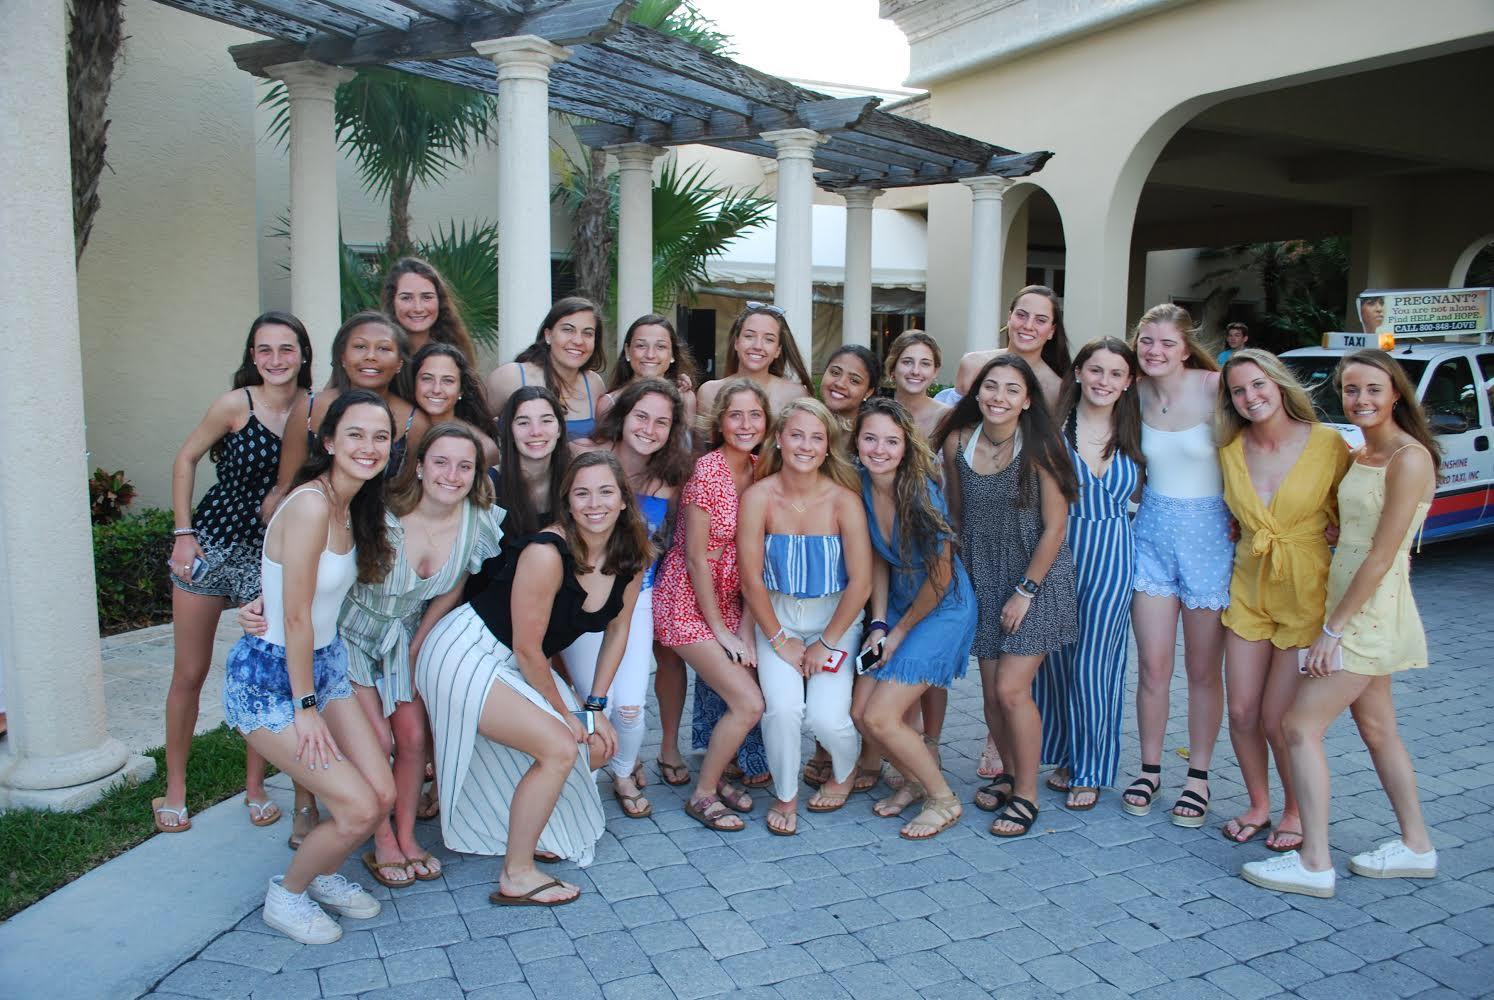 The AHC varsity lacrosse team in Del Ray, Florida over spring break.